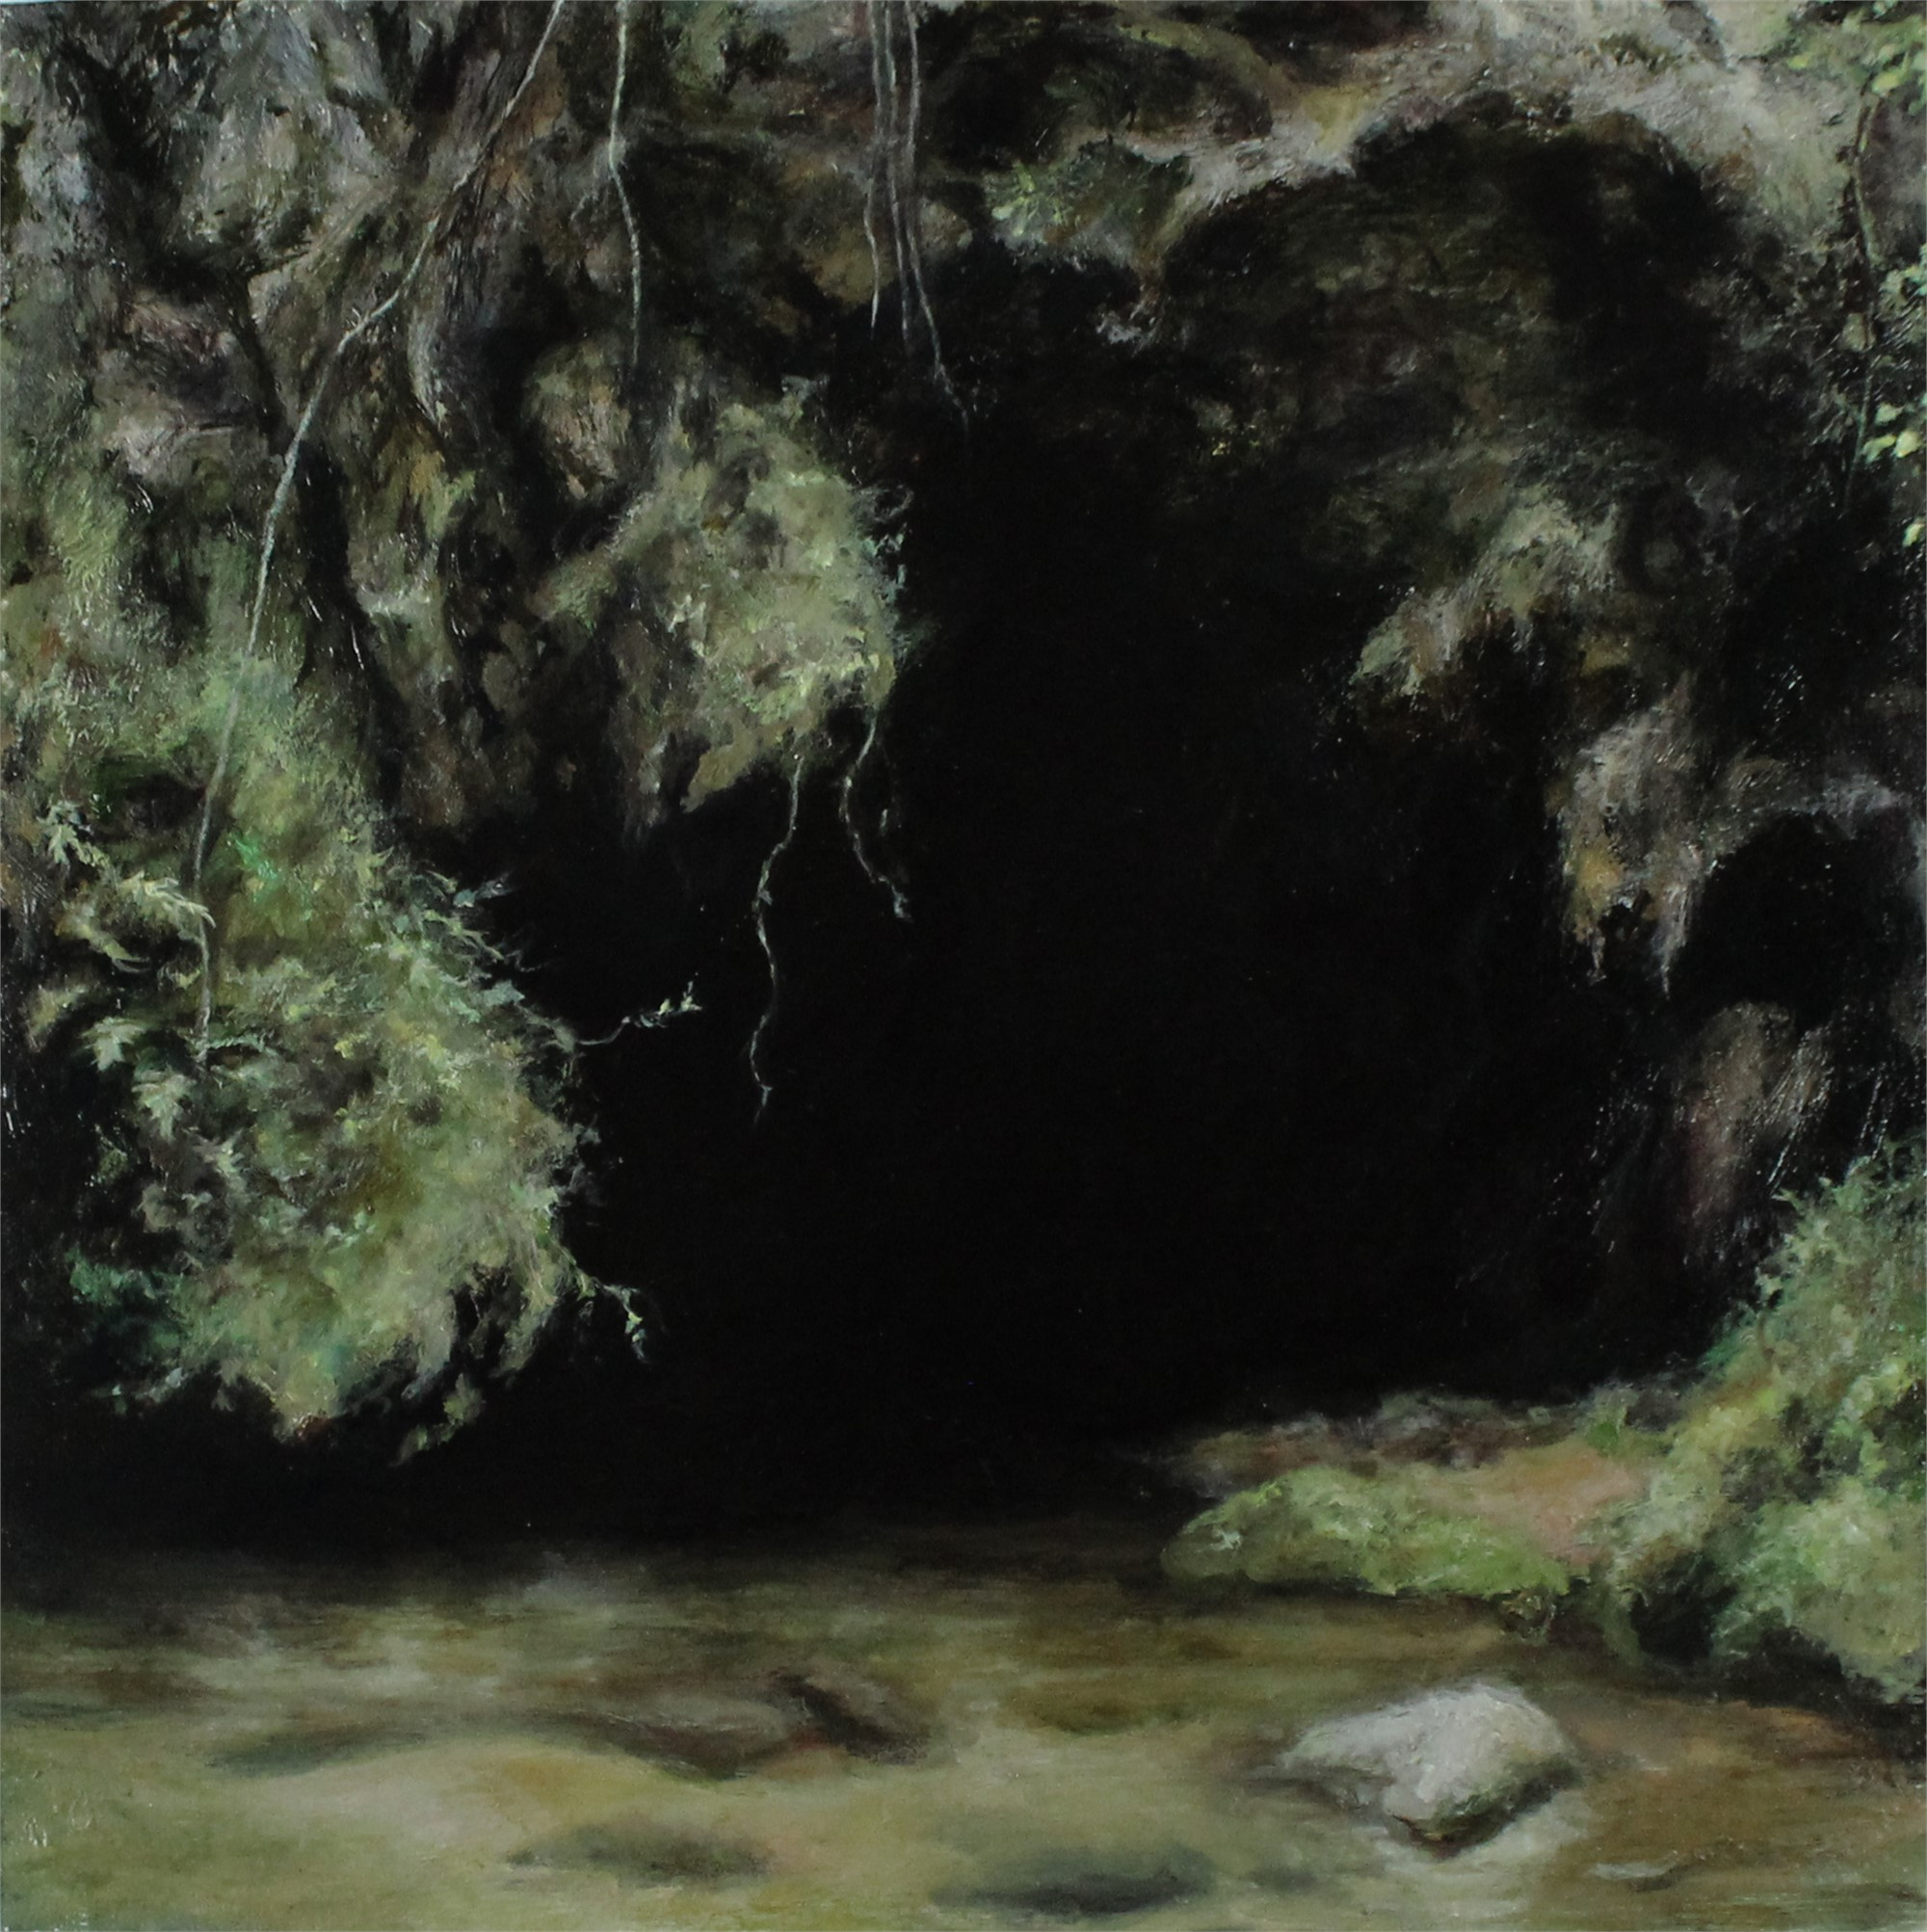 Passage by Elsa Muñoz